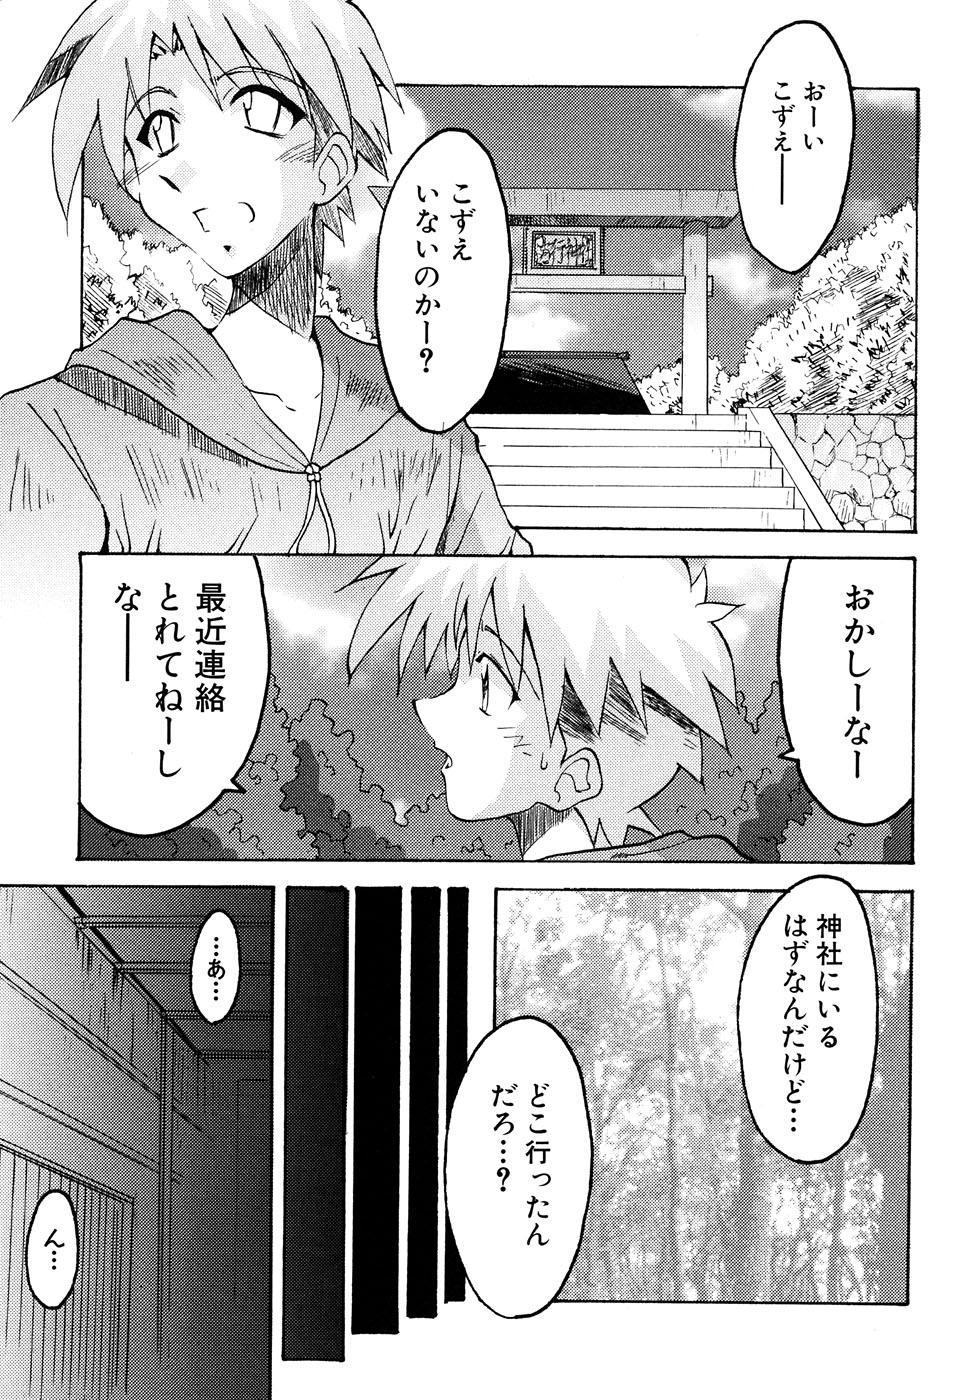 Fechikko VS Series ROUND.2 Miko San VS Maid San 25